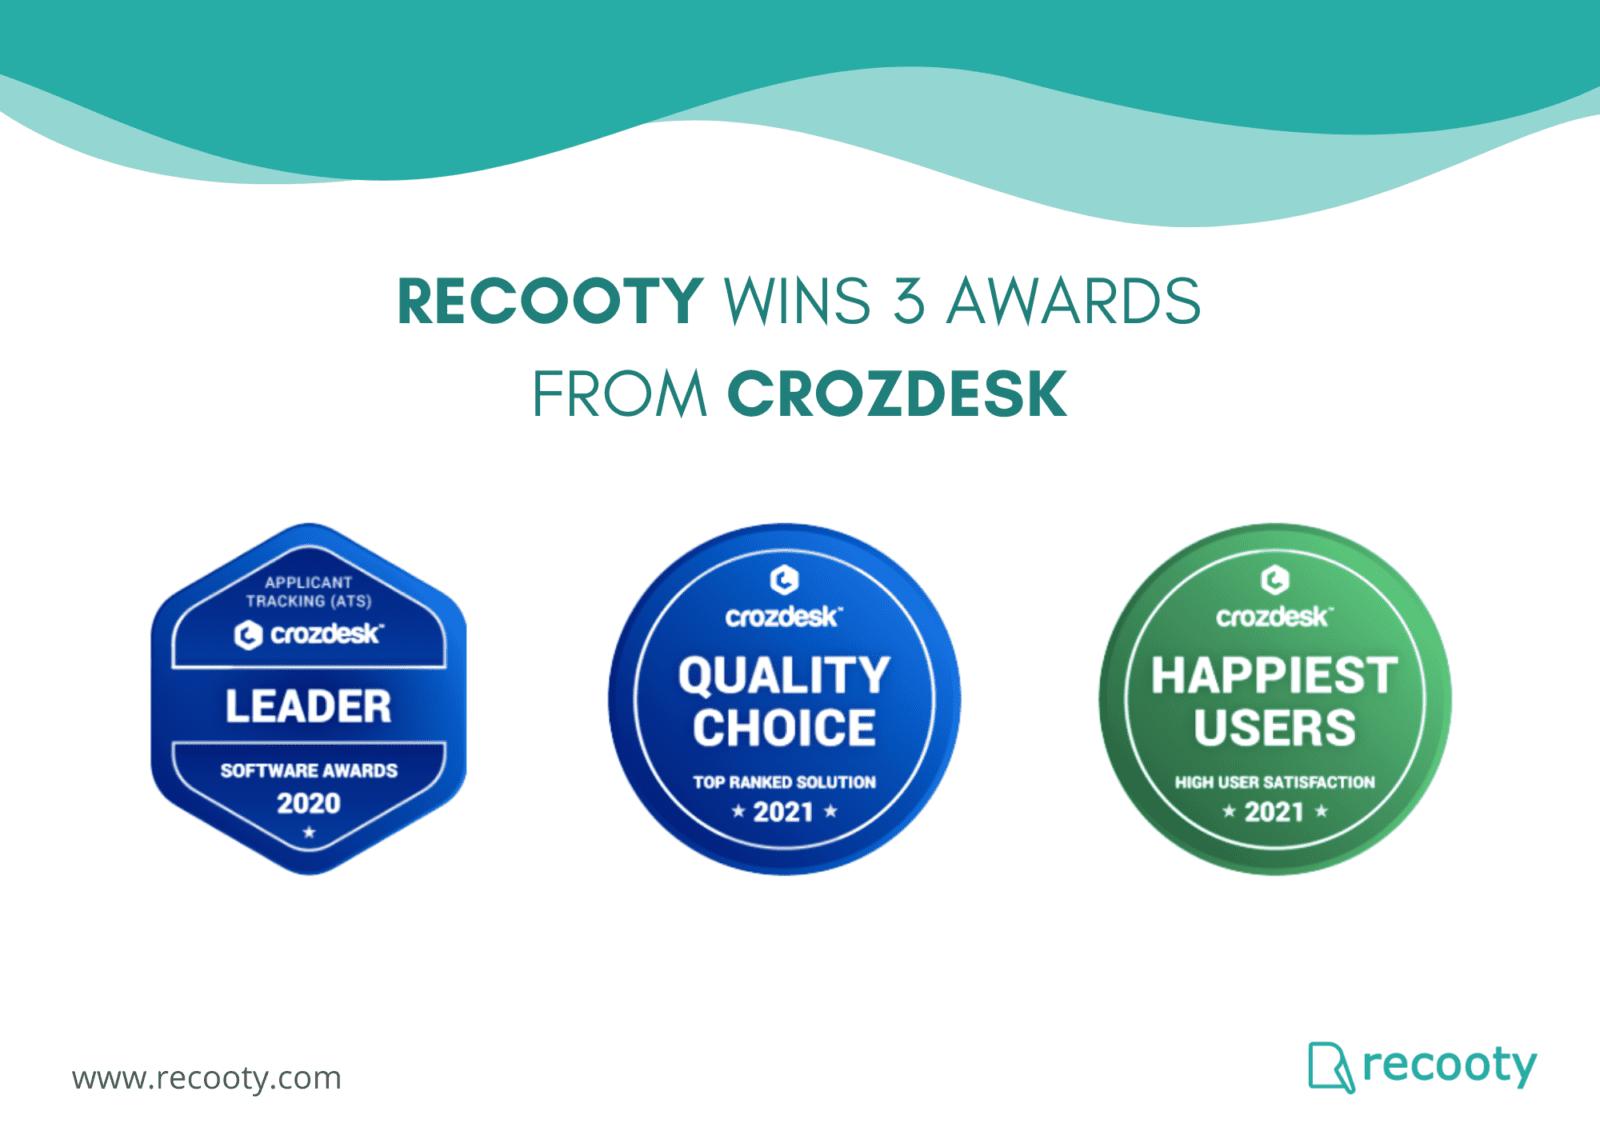 Corzdesk awards recooty. Crozdesk recognition awards 2020. Crozdesk recognition awards 2021. Recooty receives awards from Crozdesk.